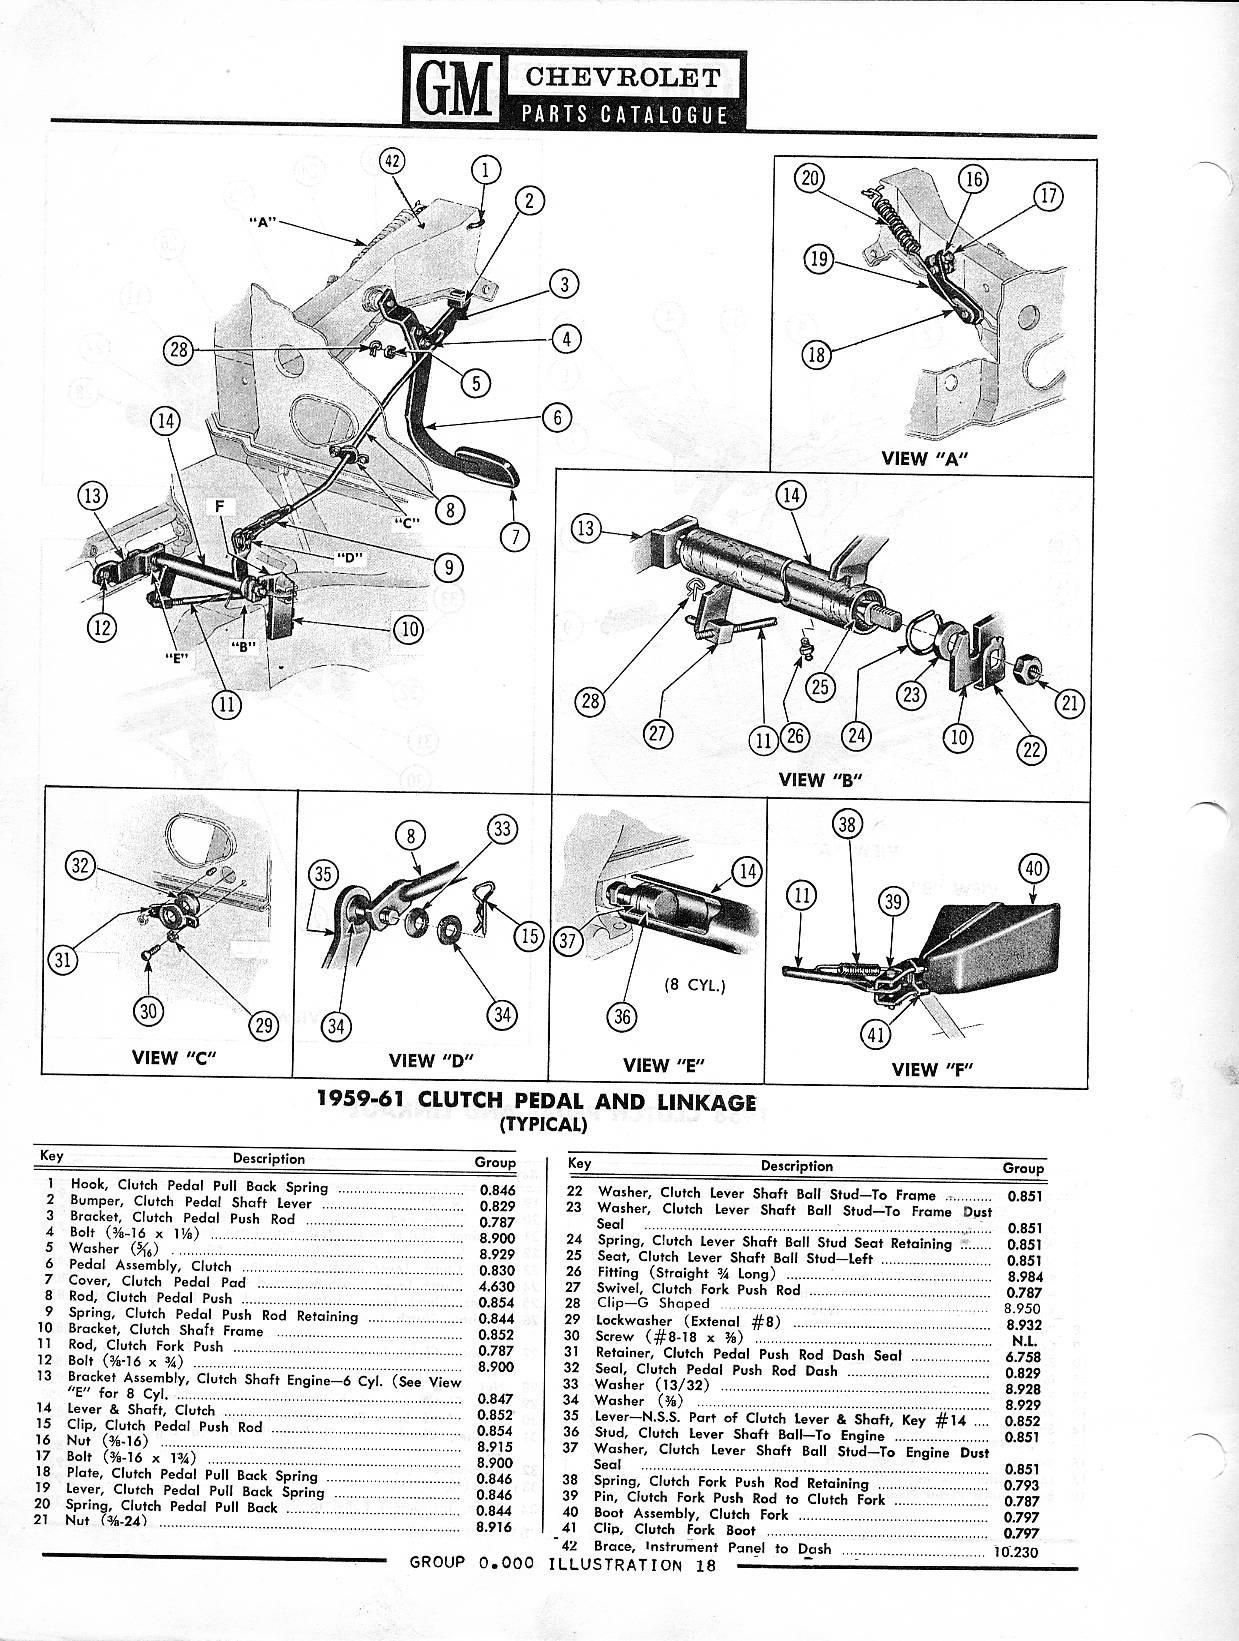 1958-1968 Chevrolet Parts Catalog / Image133.jpg